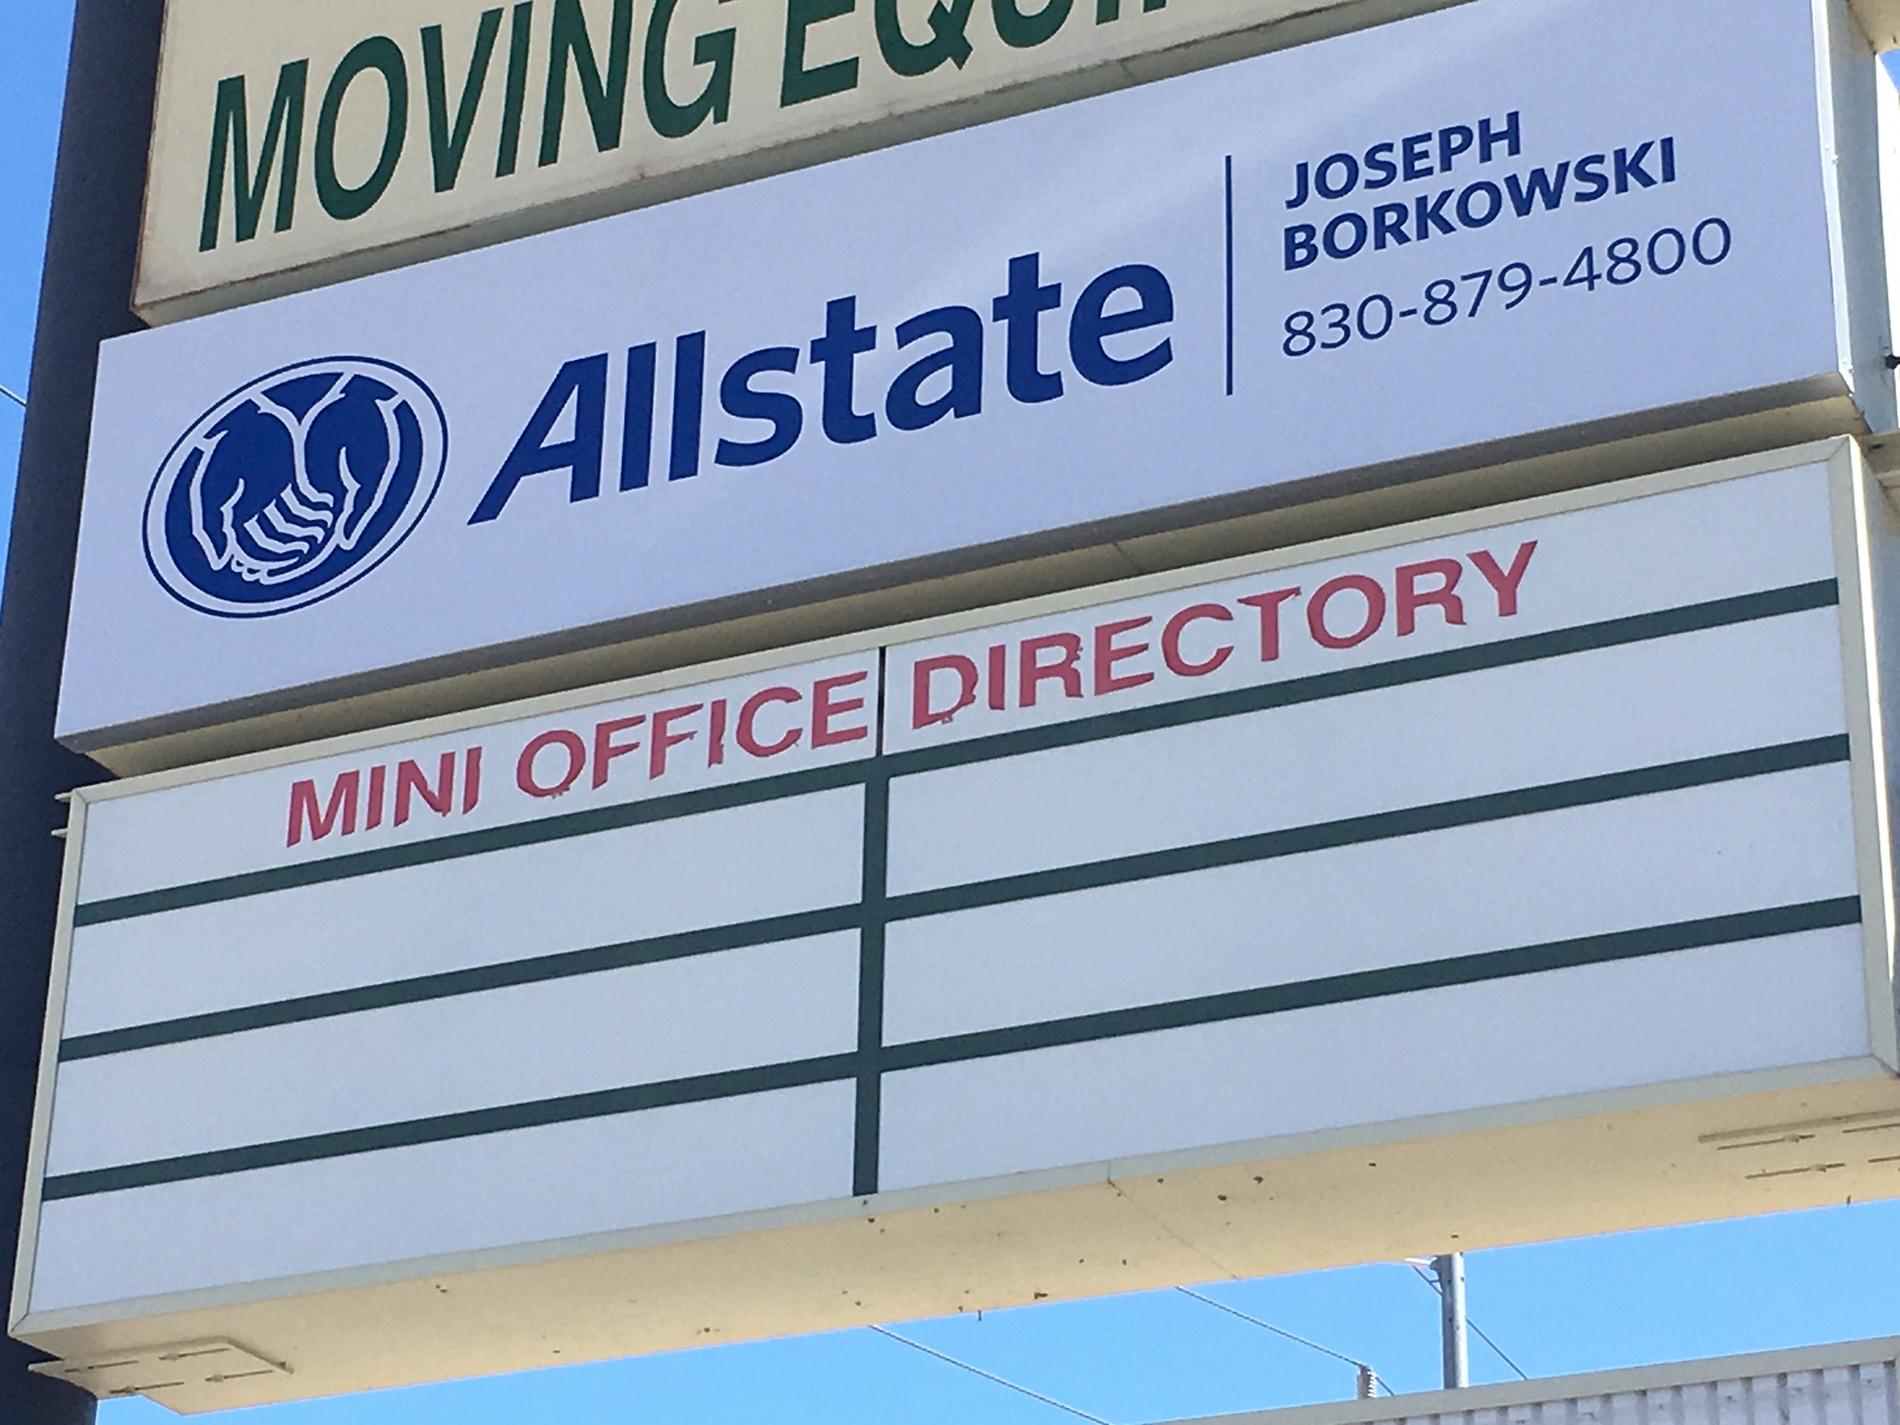 Allstate | Car Insurance in San Antonio, TX - Joseph Borkowski